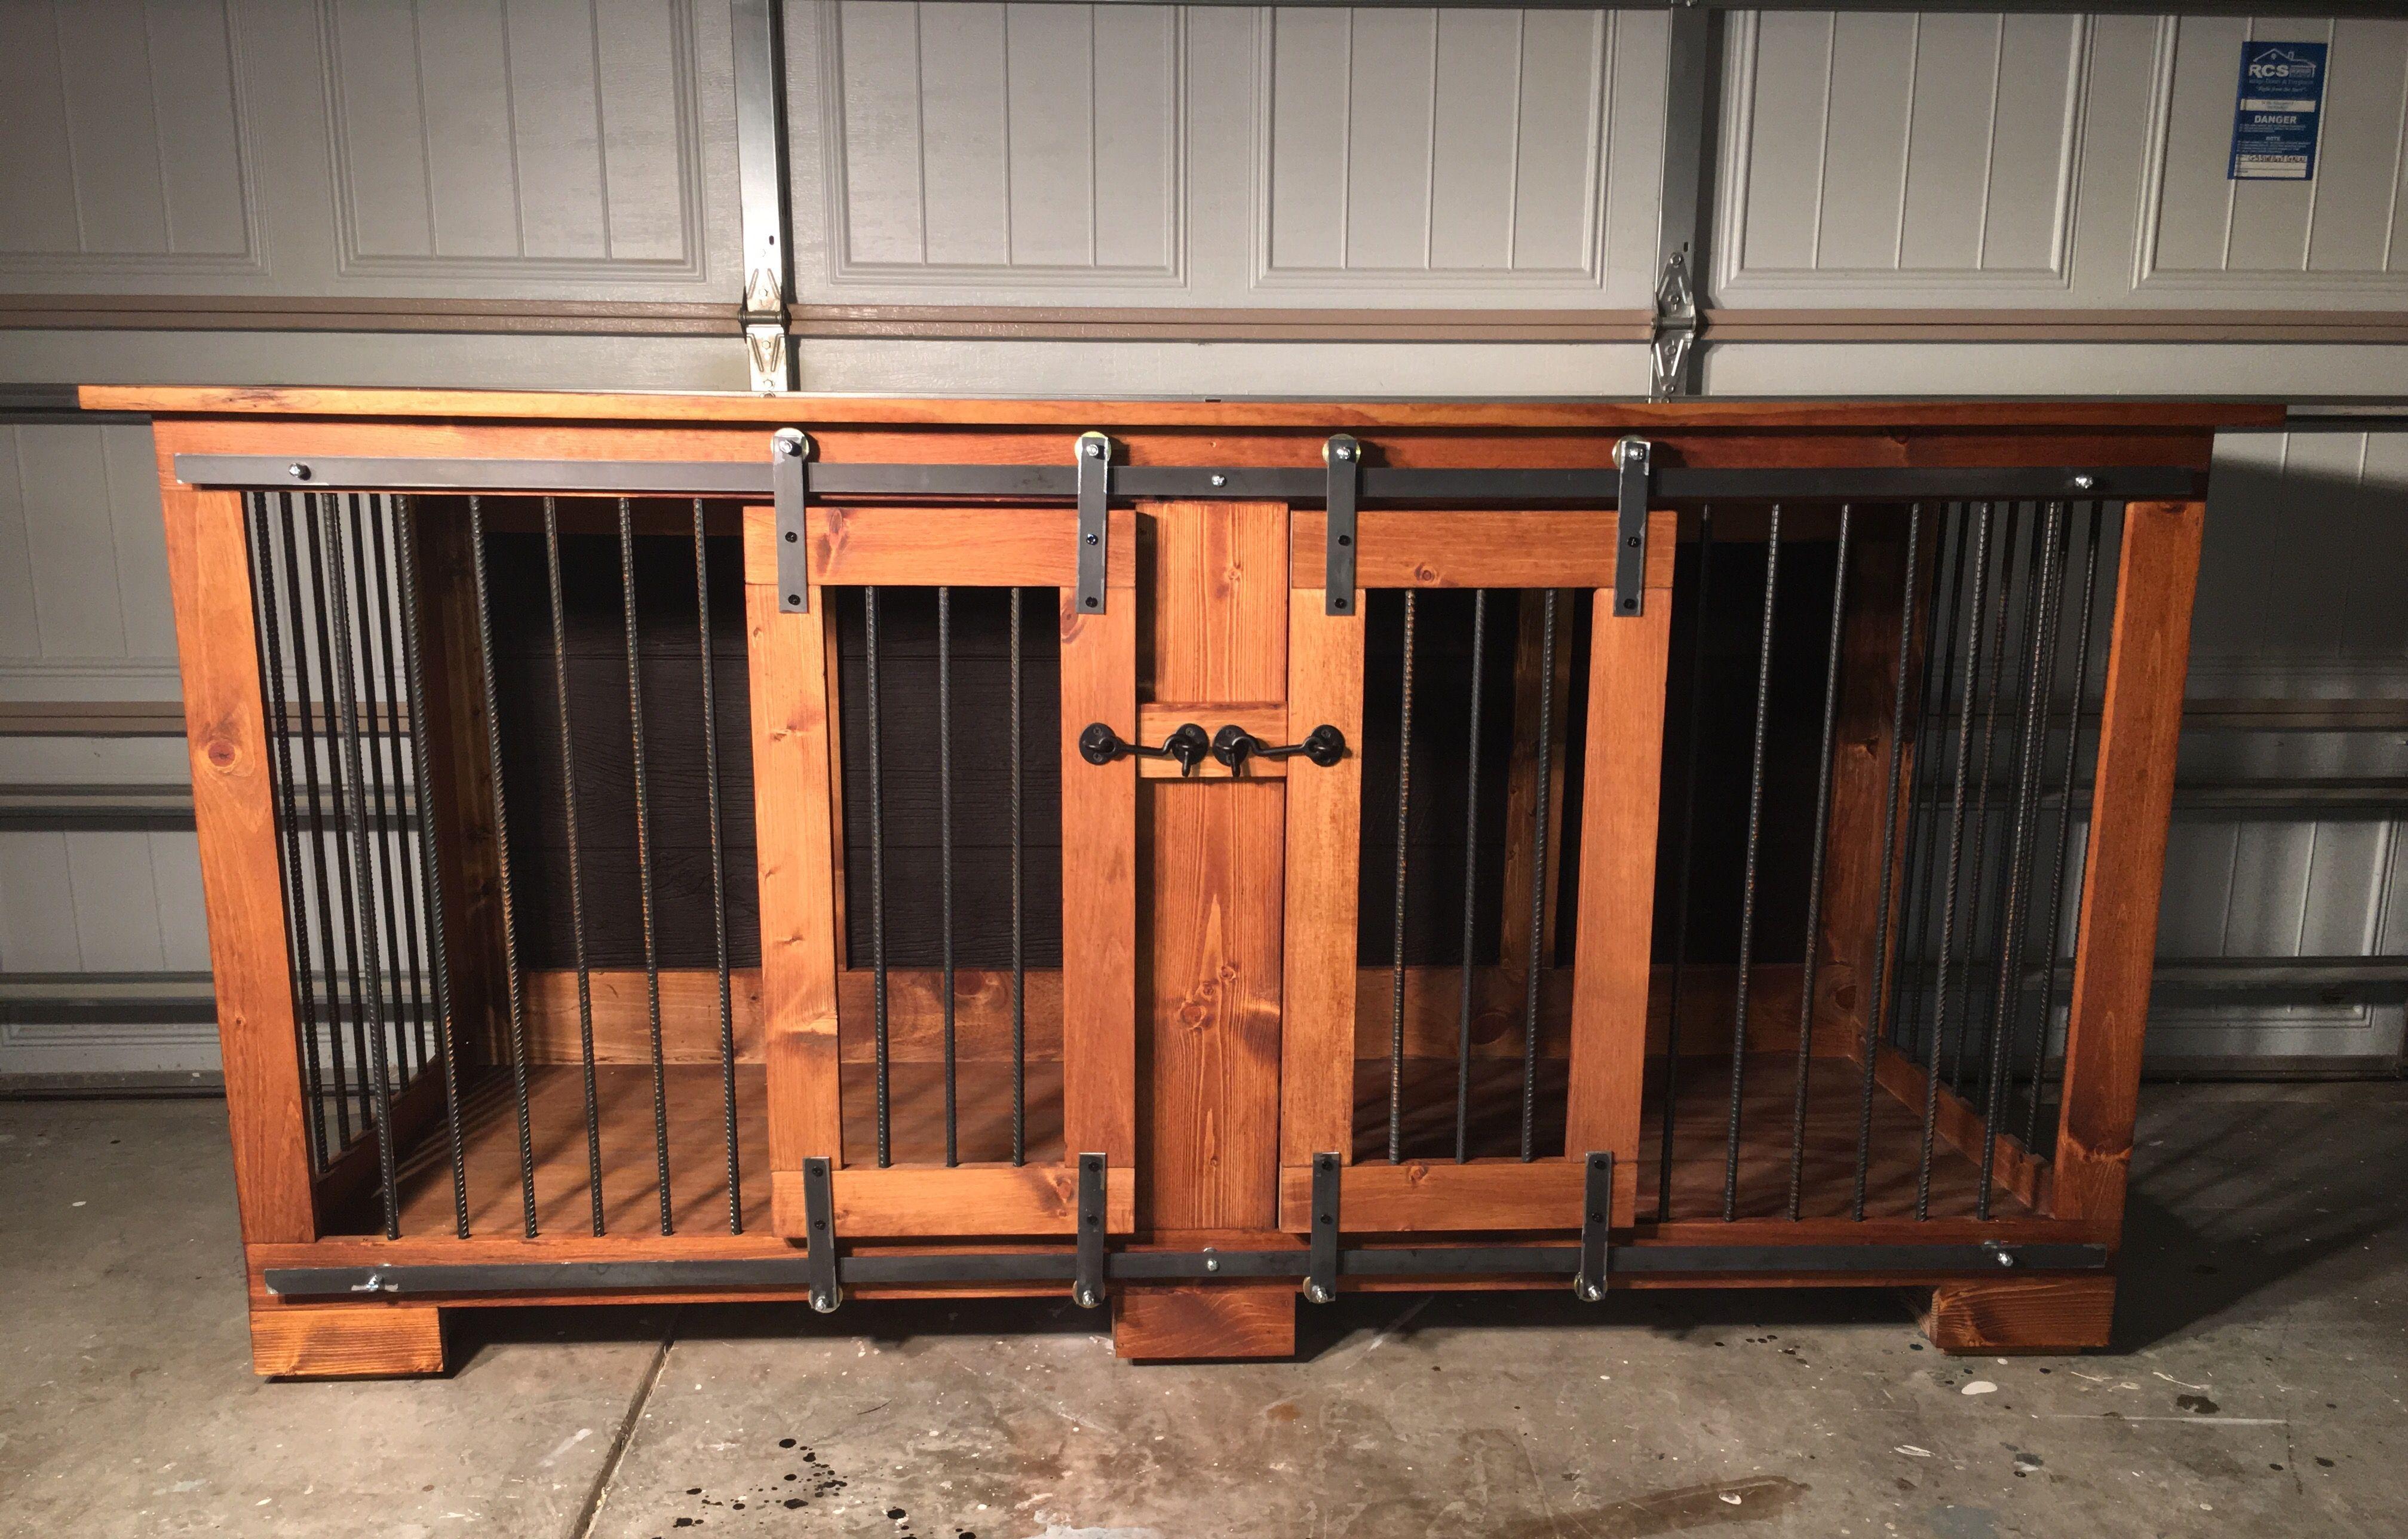 KK Custom Crates Charlotte NC Dog Furniture #dogcrate #dogkennel  #dogfurniture